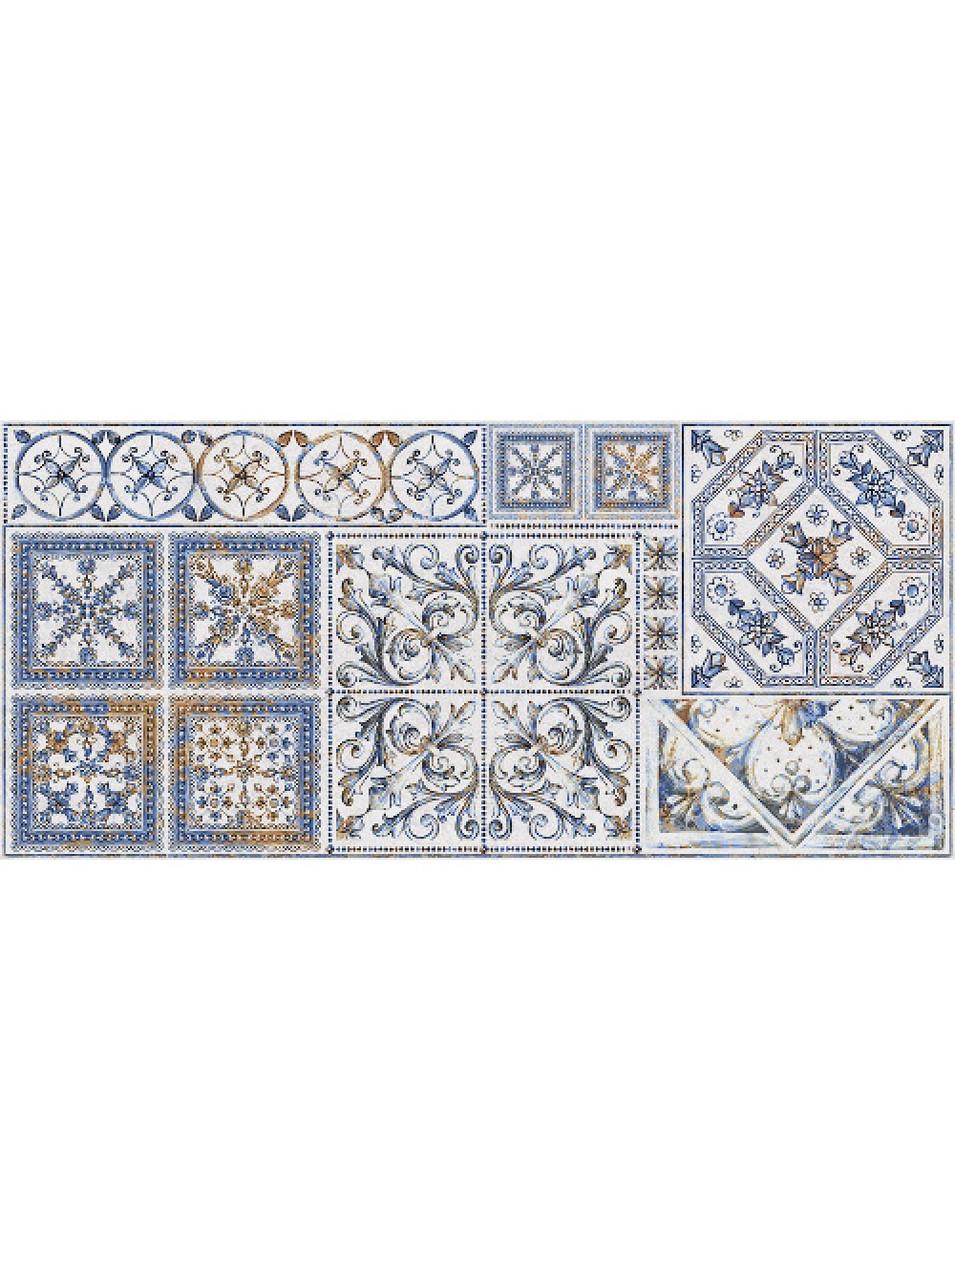 VIVA декор серый / Д 145 031-3